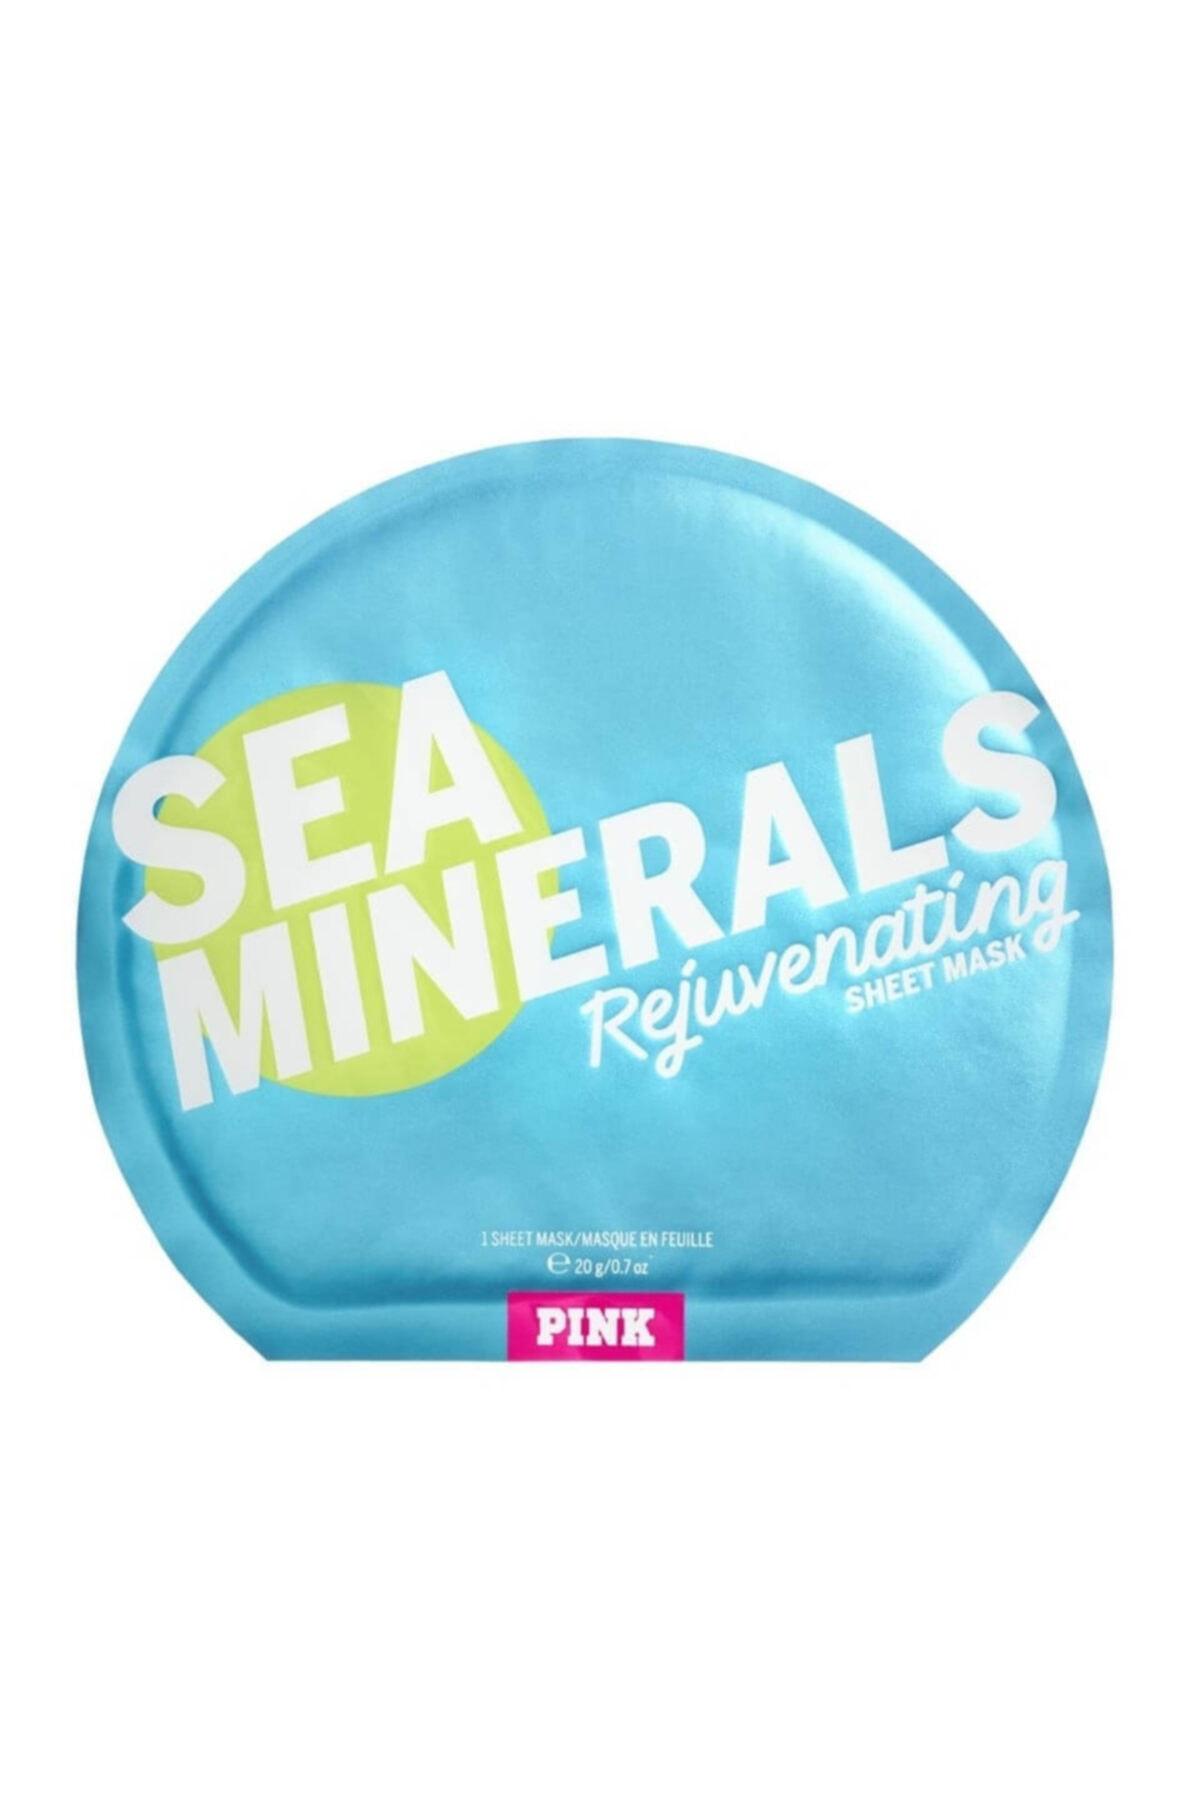 Victoria's Secret Pink Deniz Mineralli Gençleştirici 1